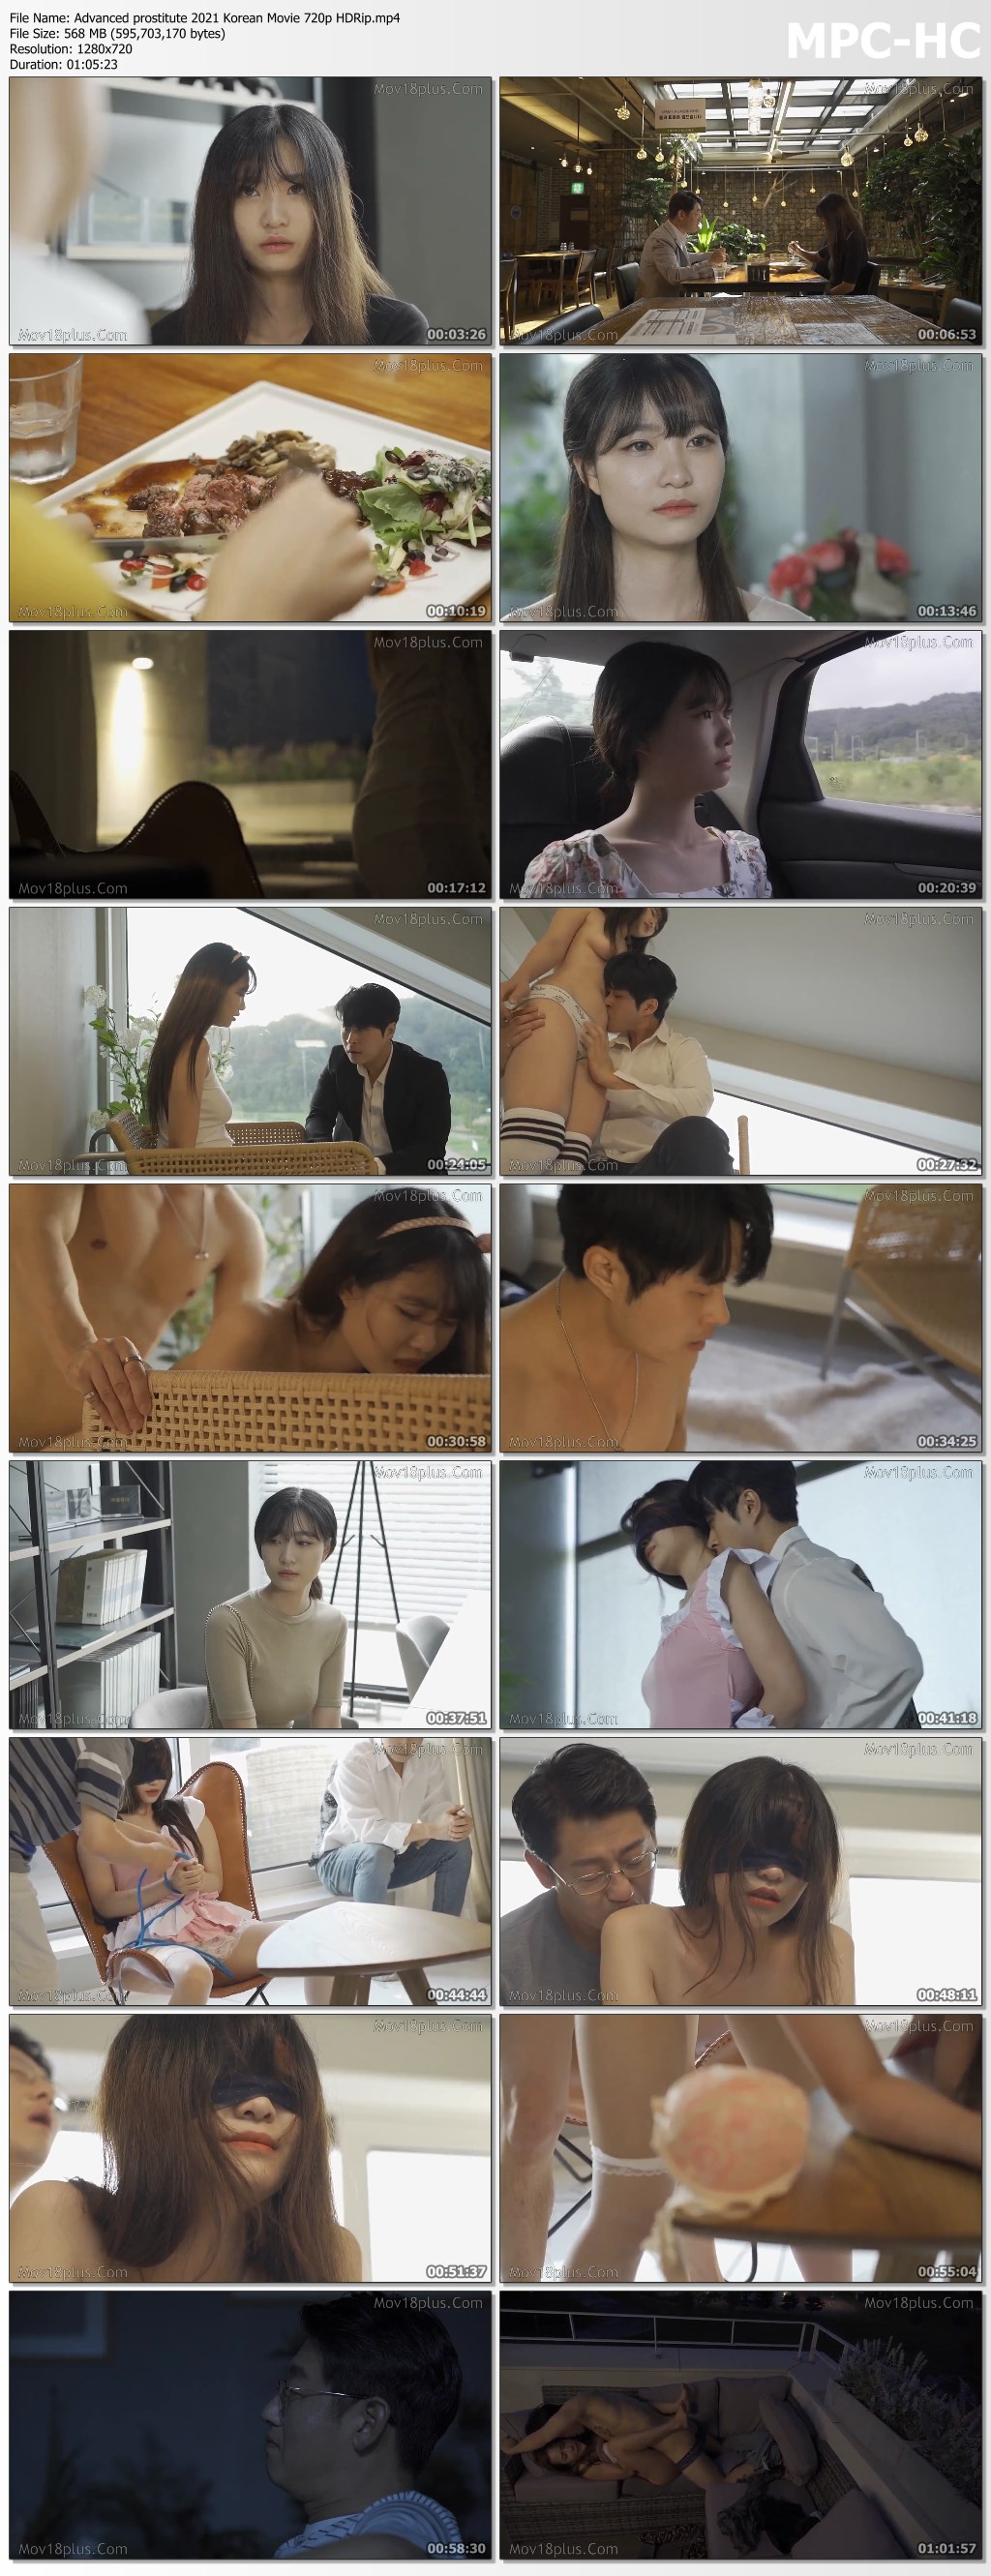 Advanced prostitute 2021 Korean Movie 720p HDRip.mp4 thumbs